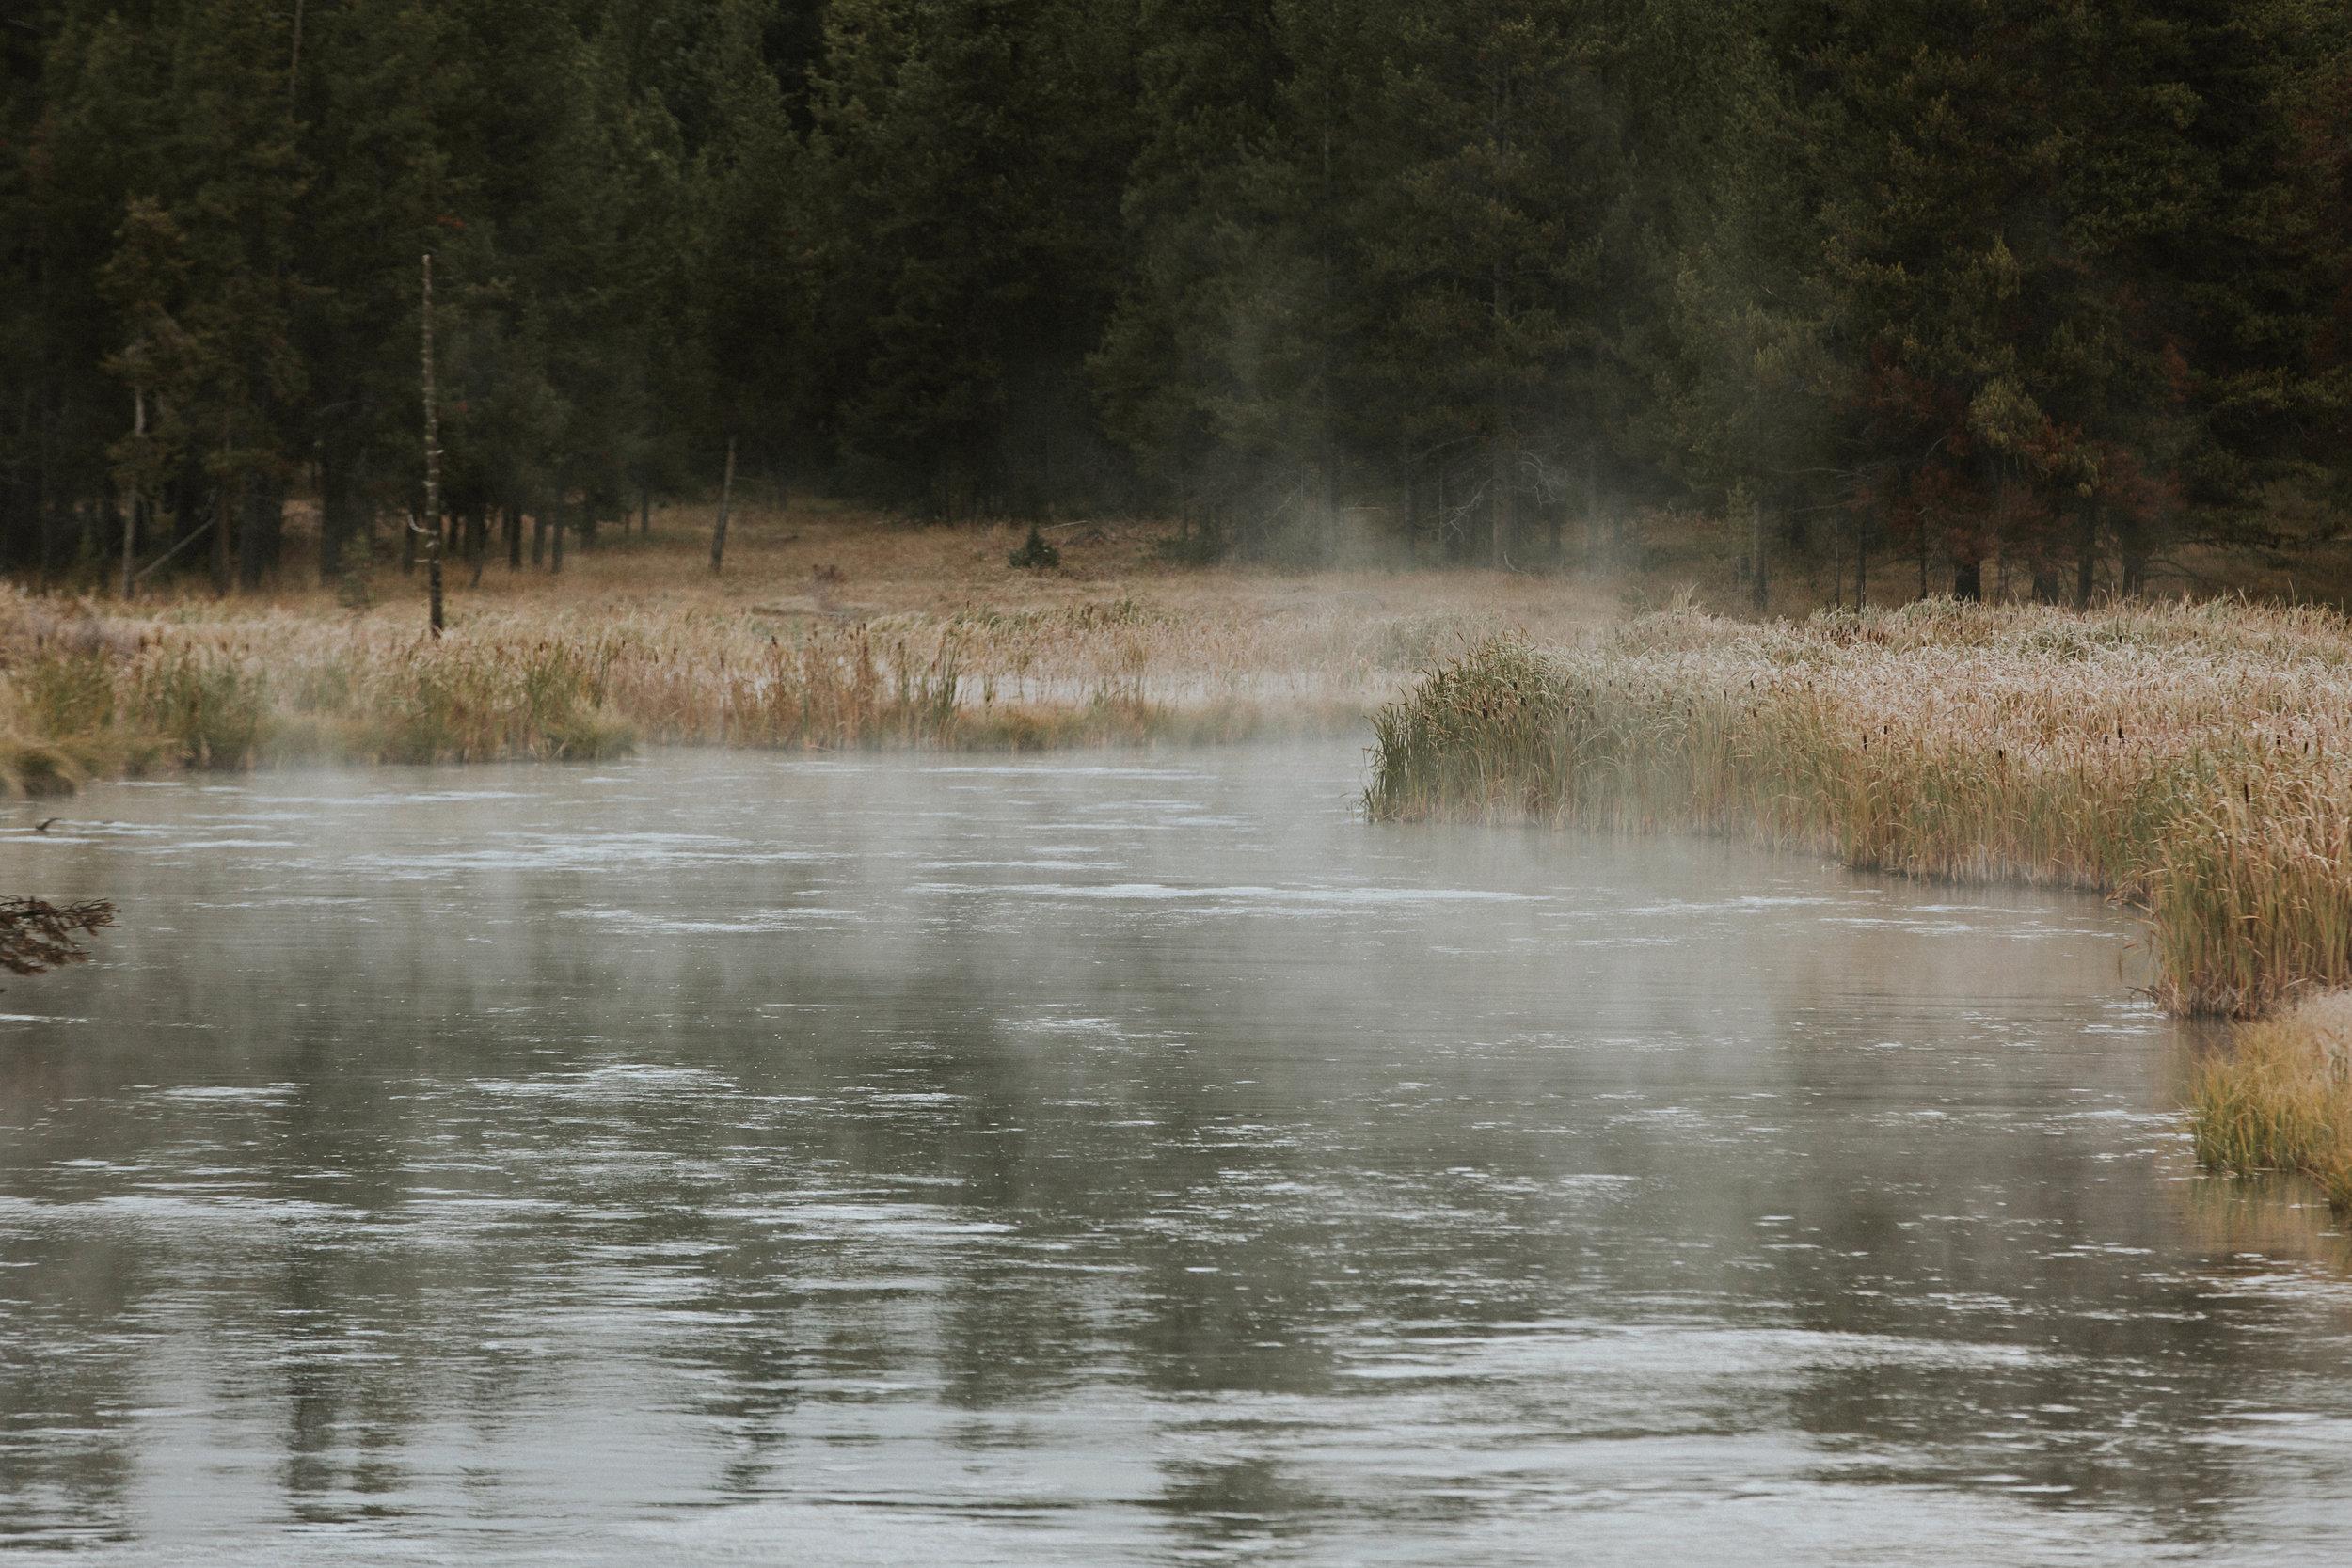 CindyGiovagnoli_Yellowstone_Grand_Teton_National_Park_Wyoming_mountains_deer_sunset_fall_autumn_October_alpenglow-003.jpg